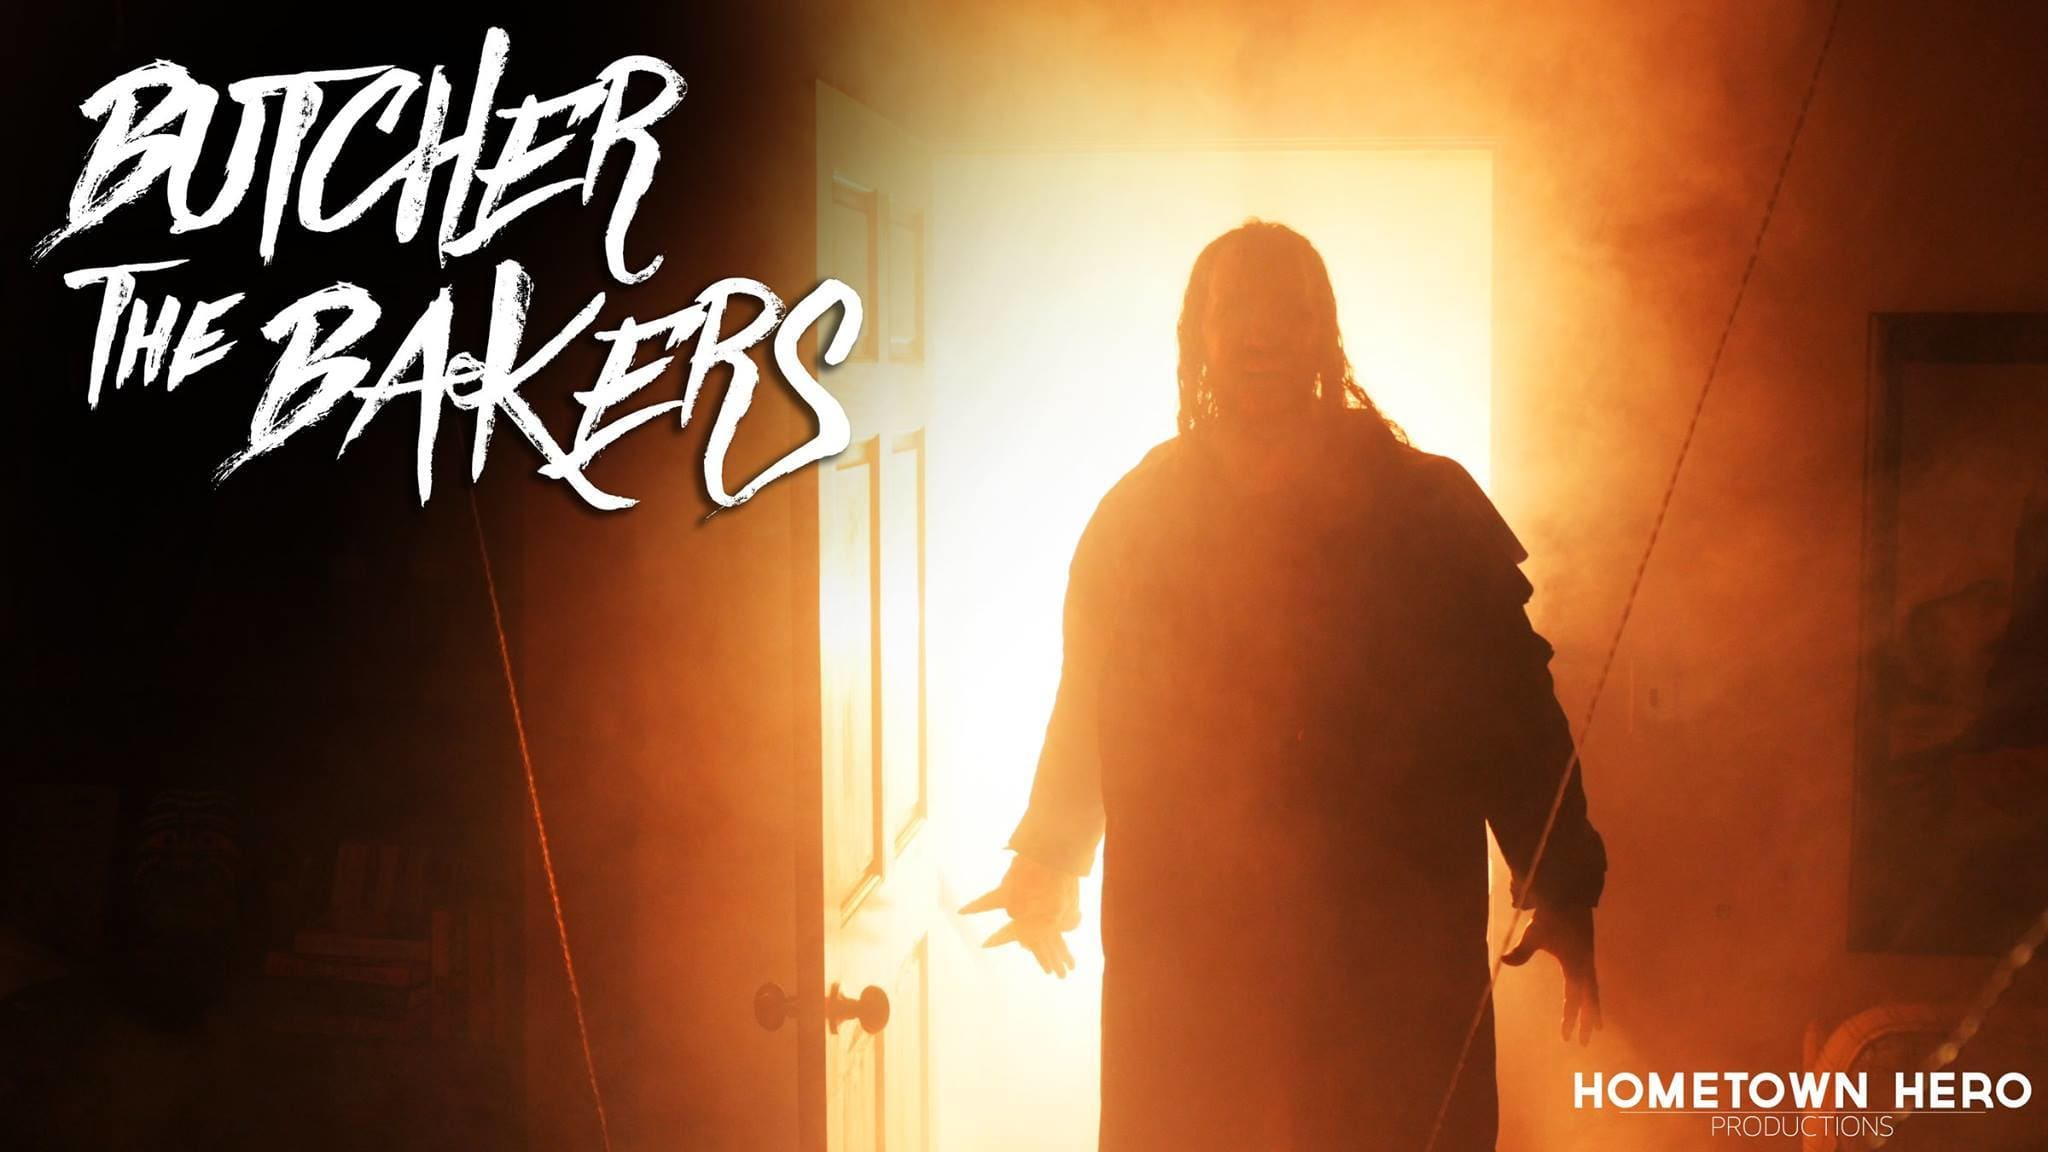 Regarder Butcher the Bakers en streaming gratuit